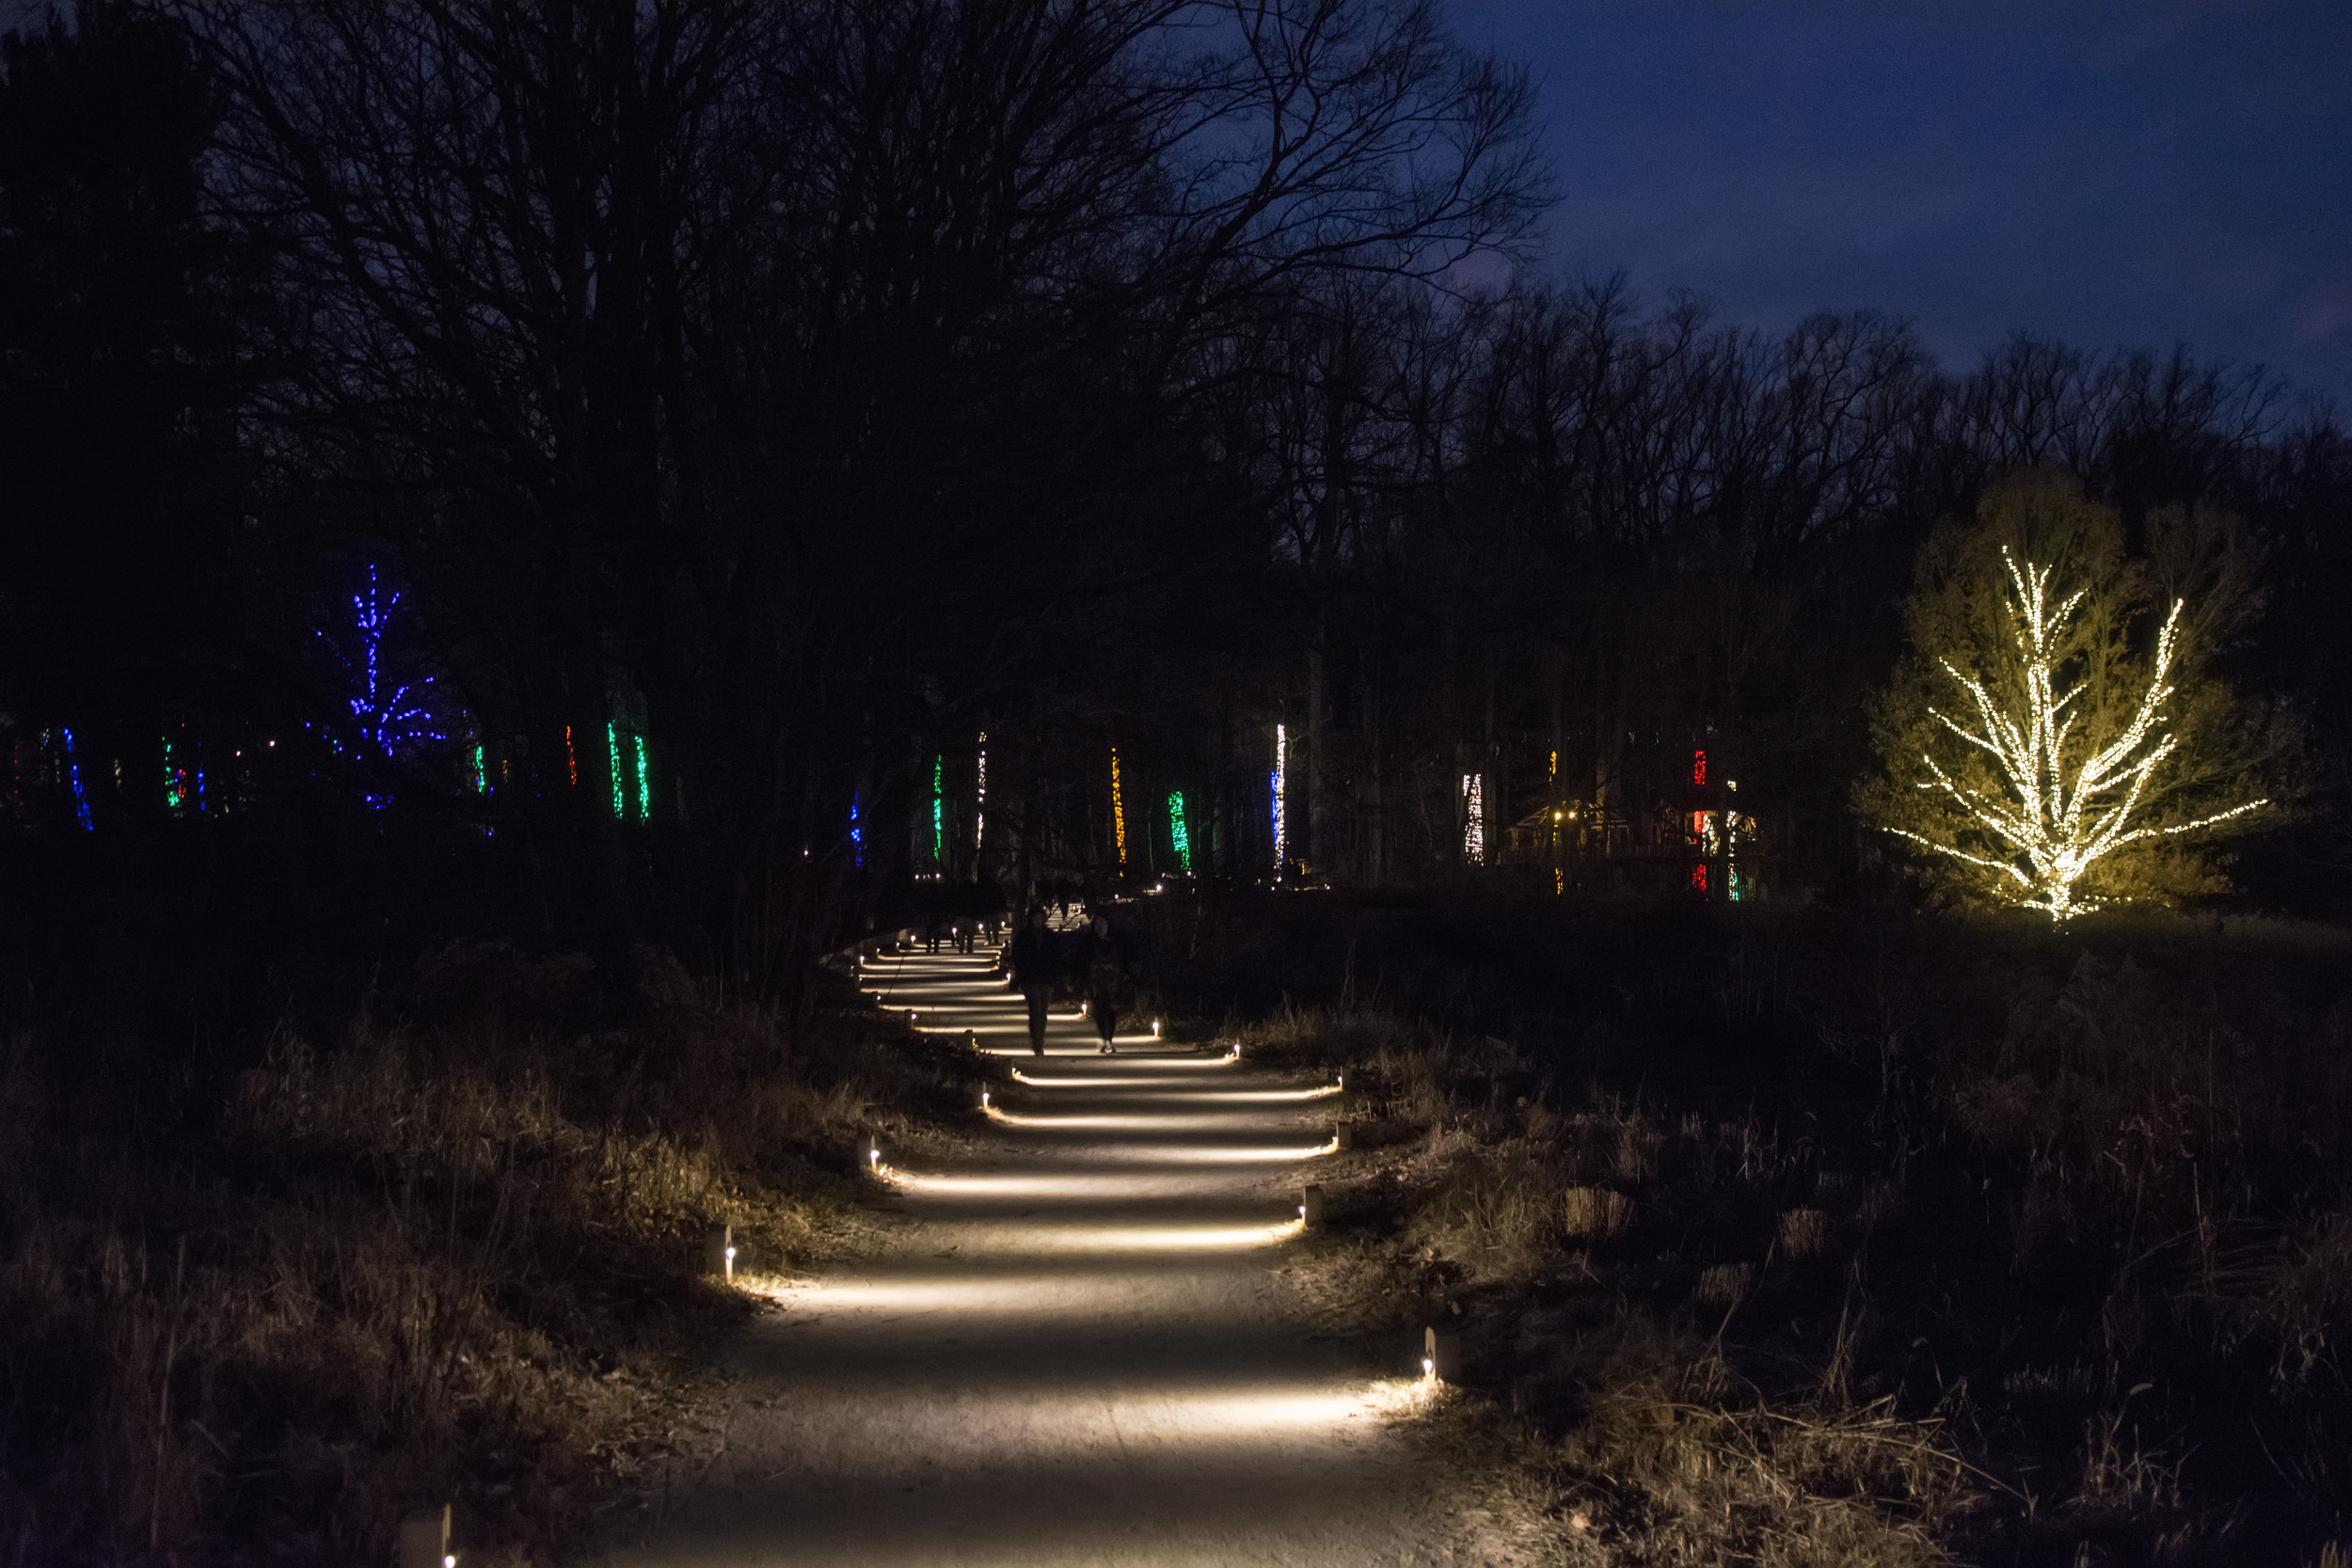 Meadow walkway at night